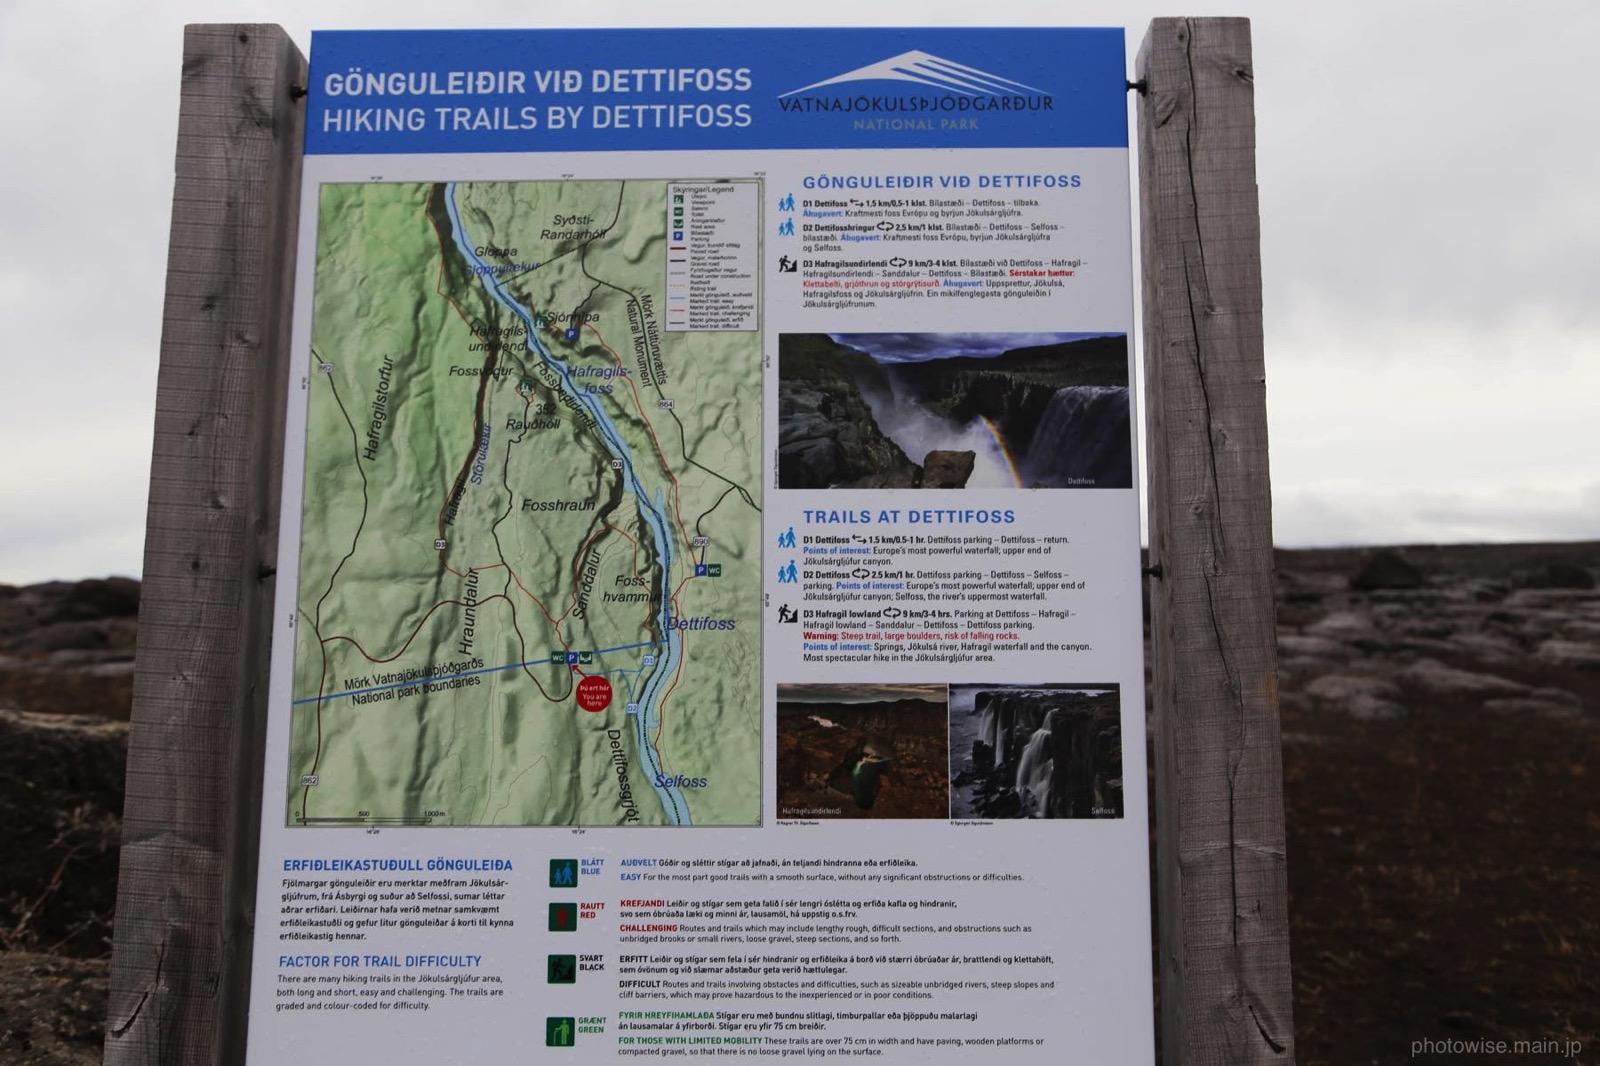 detifoss_hikingtrail